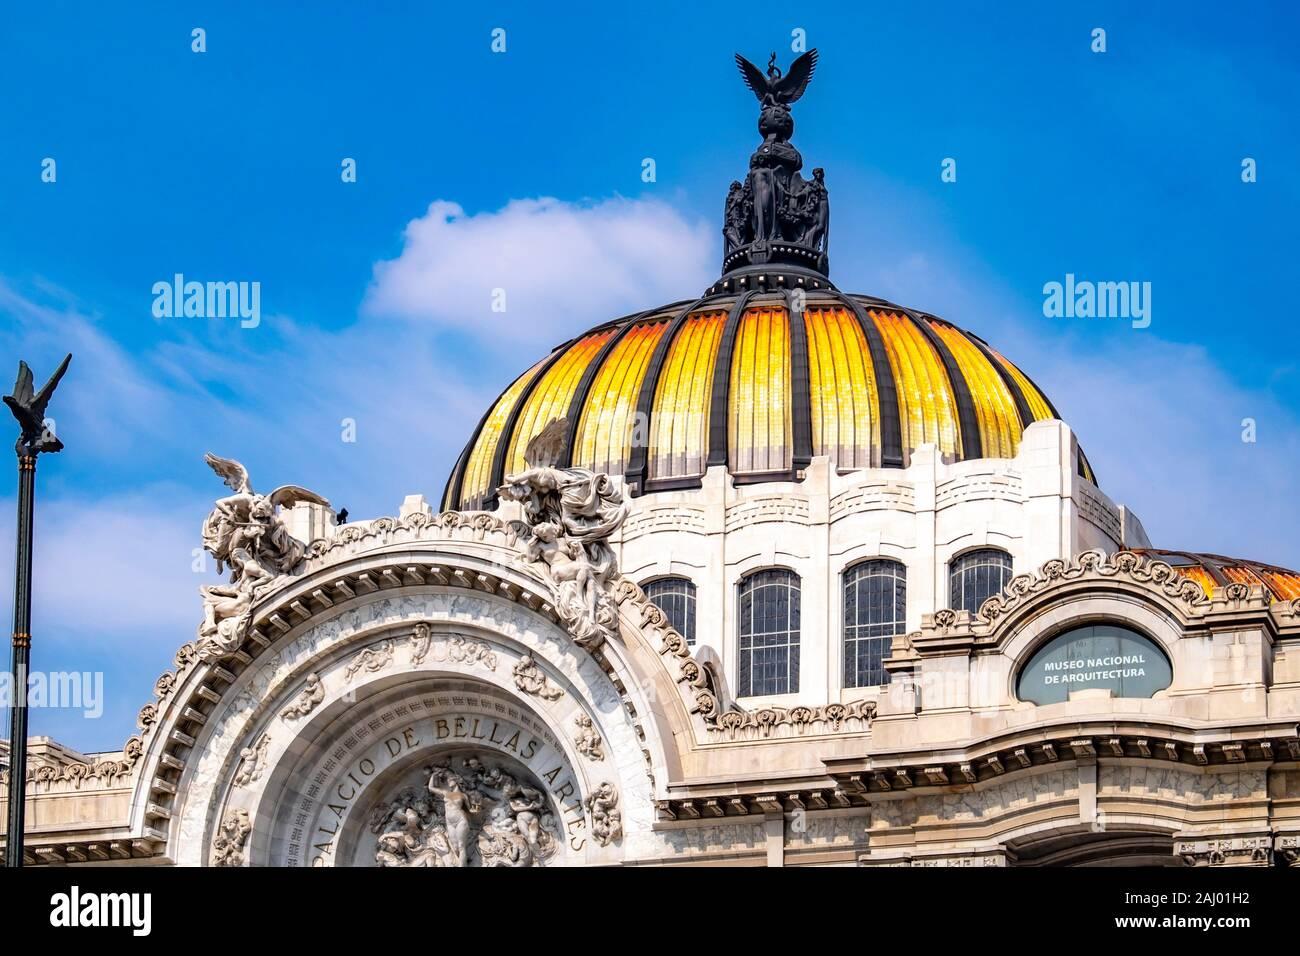 Palacio de Bellas Artes, Palace of Fine Arts, National Museum of Architecture, Mexico City, Federal District, Mexico. Stock Photo